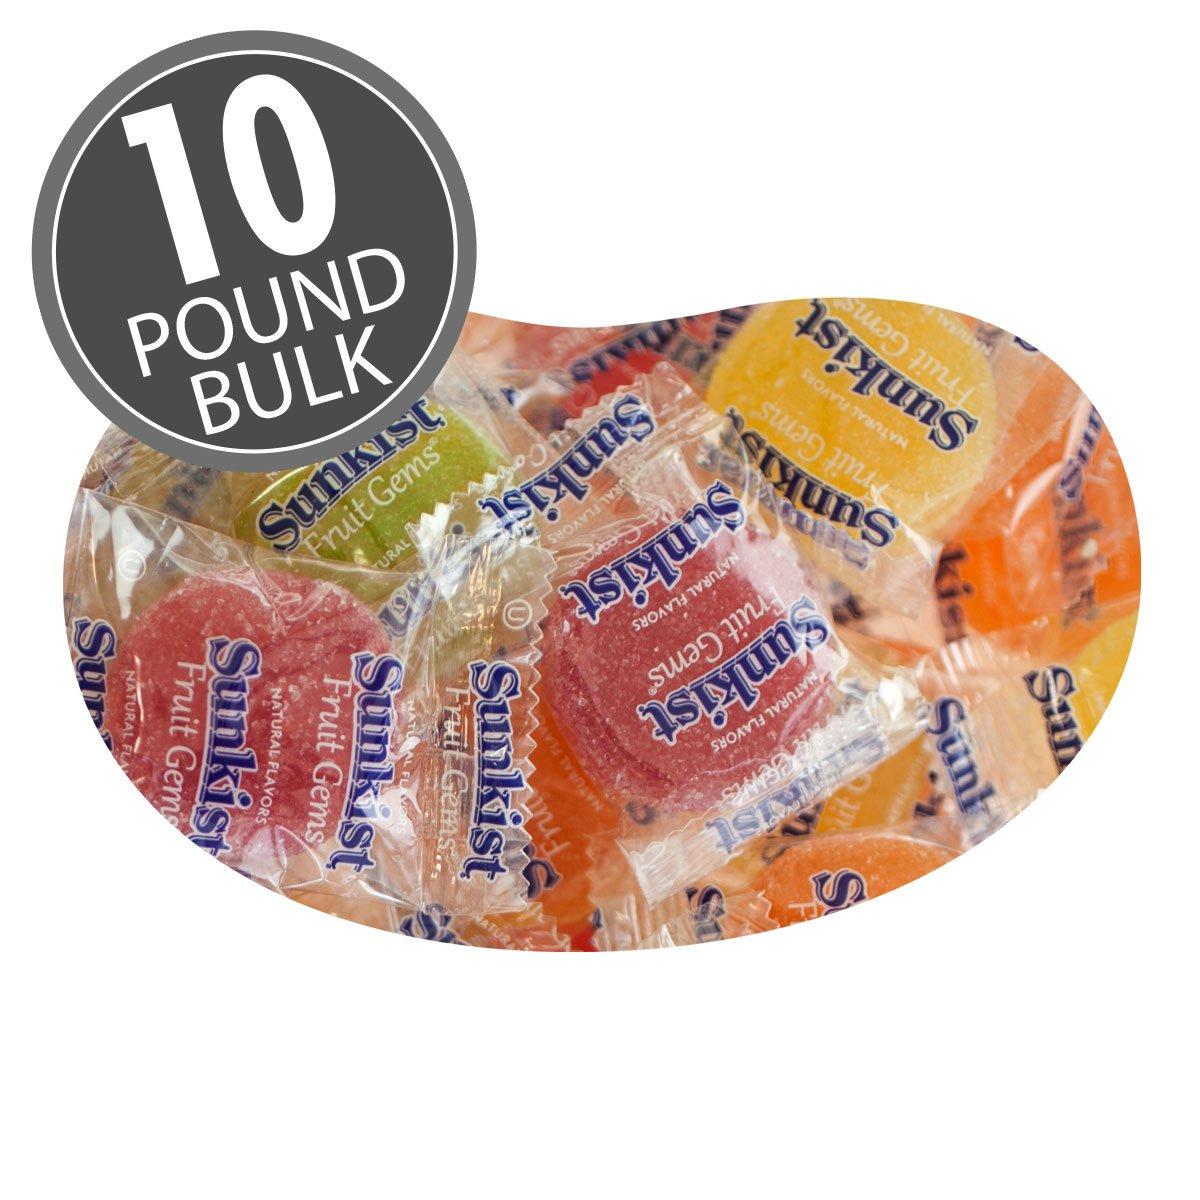 Sunkist® Fruit Gems (Wrapped) - 10 lbs bulk